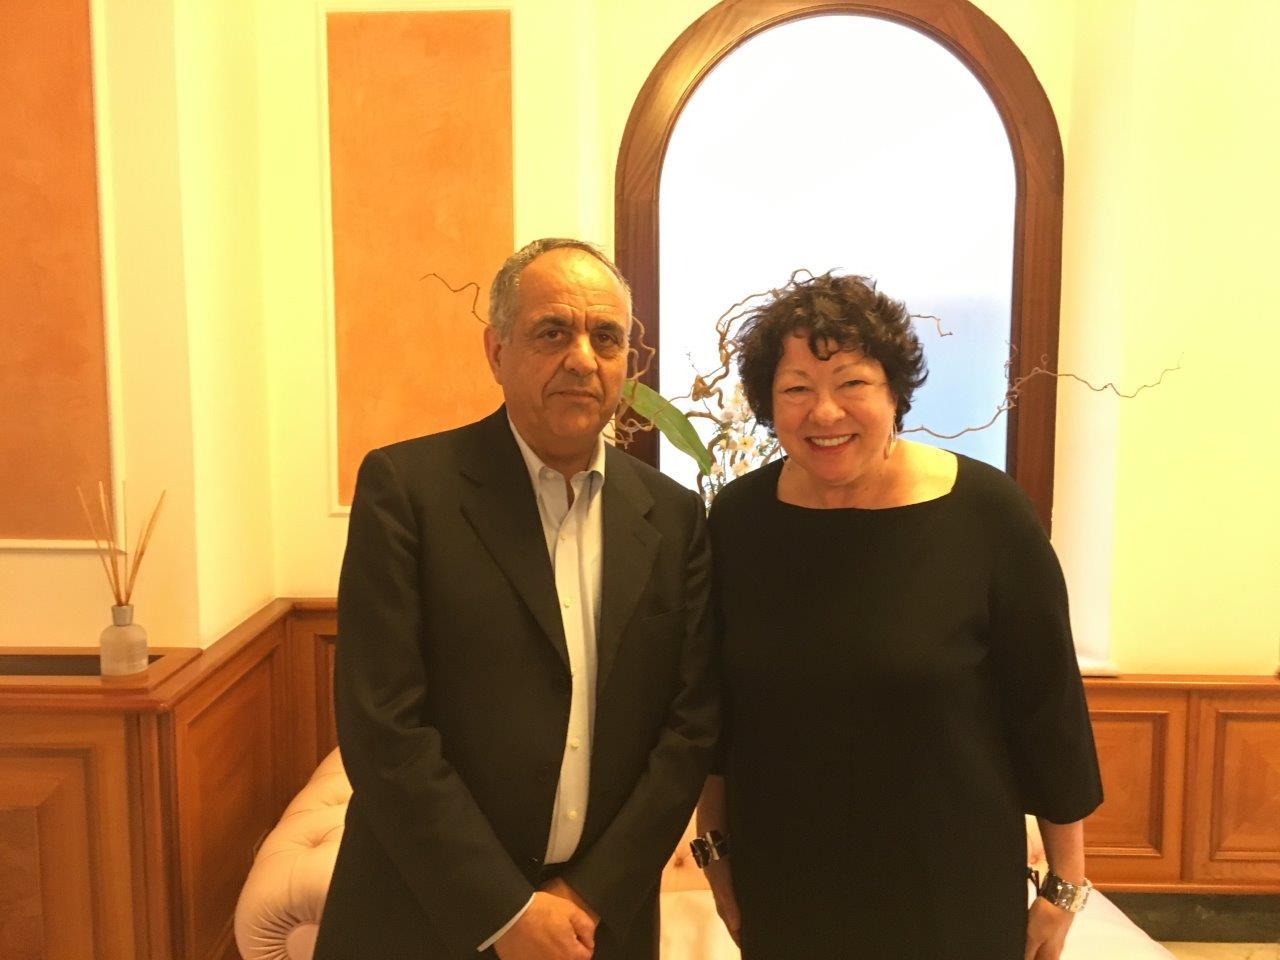 La giudice Sonia Sotomayor turista a Macerata